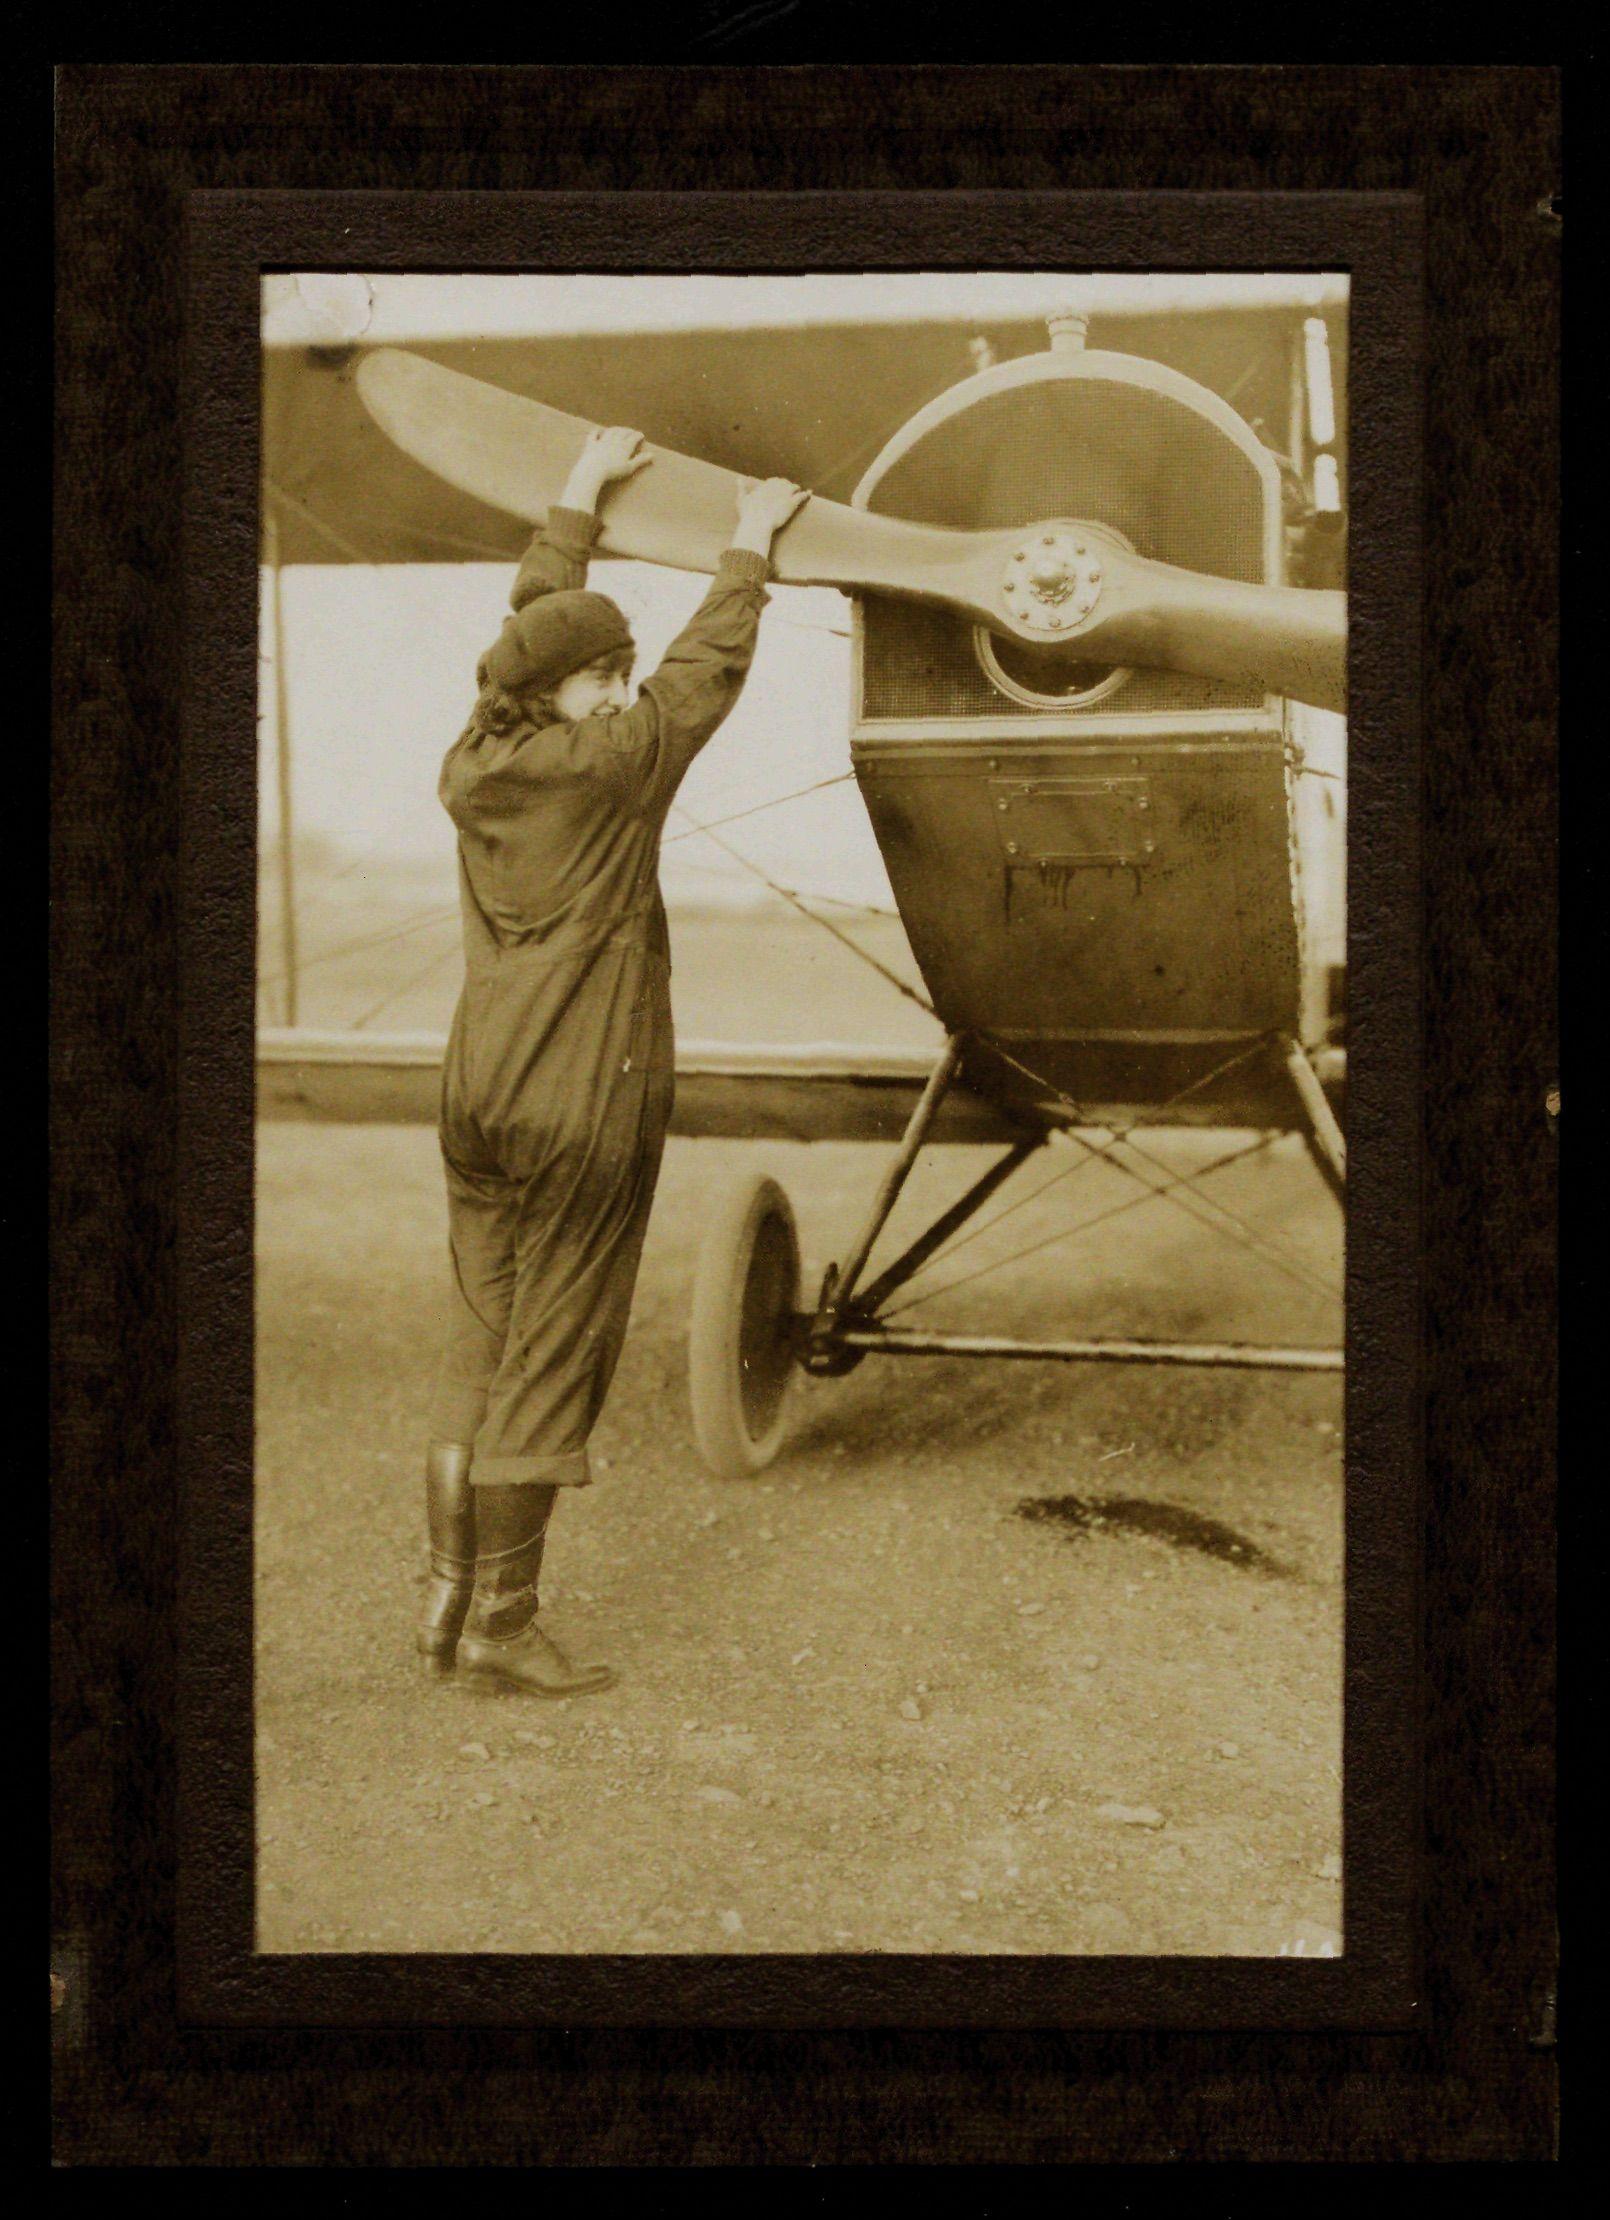 An archival image of Neta Snook, Amelia Earhart's flight instructor, adjusting a plane's propeller in 1920.